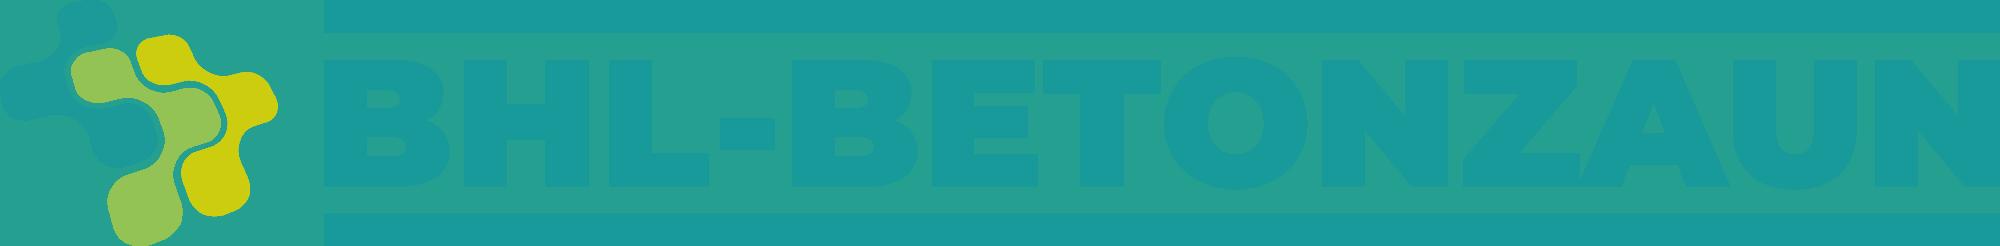 BHL-Betonzaun Logo